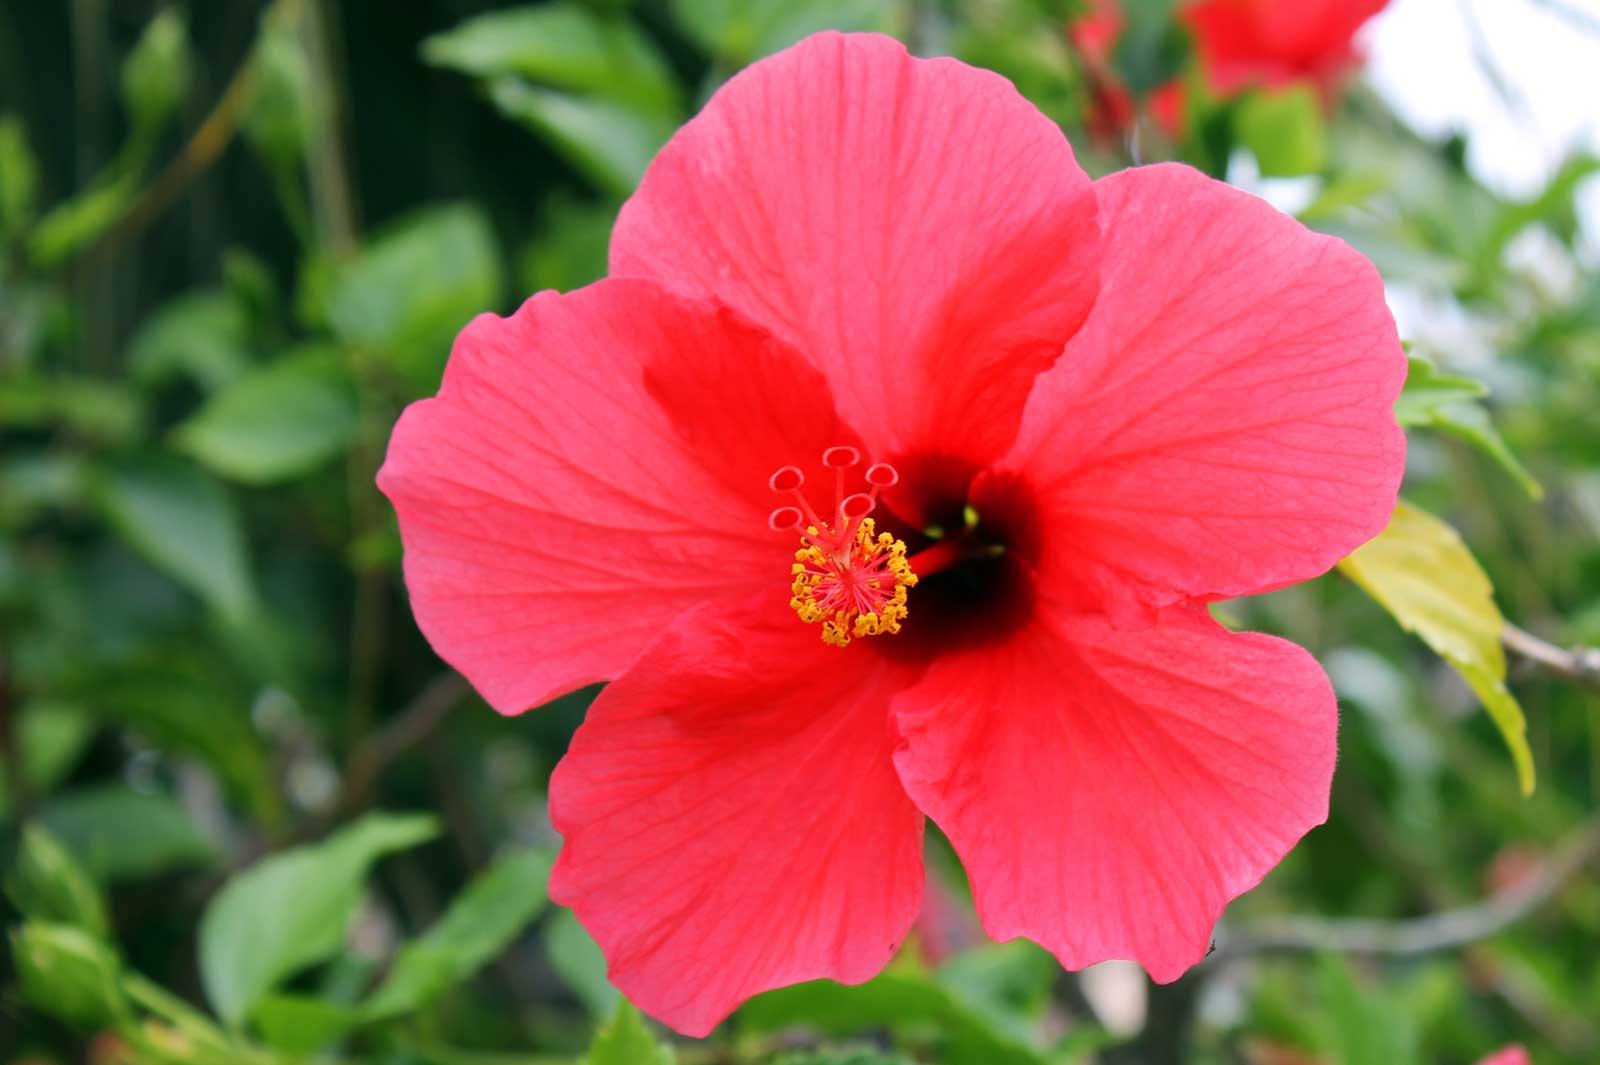 Ulaula hibiscus hawaii pictures ulaula hibiscus hawaii pictures izmirmasajfo